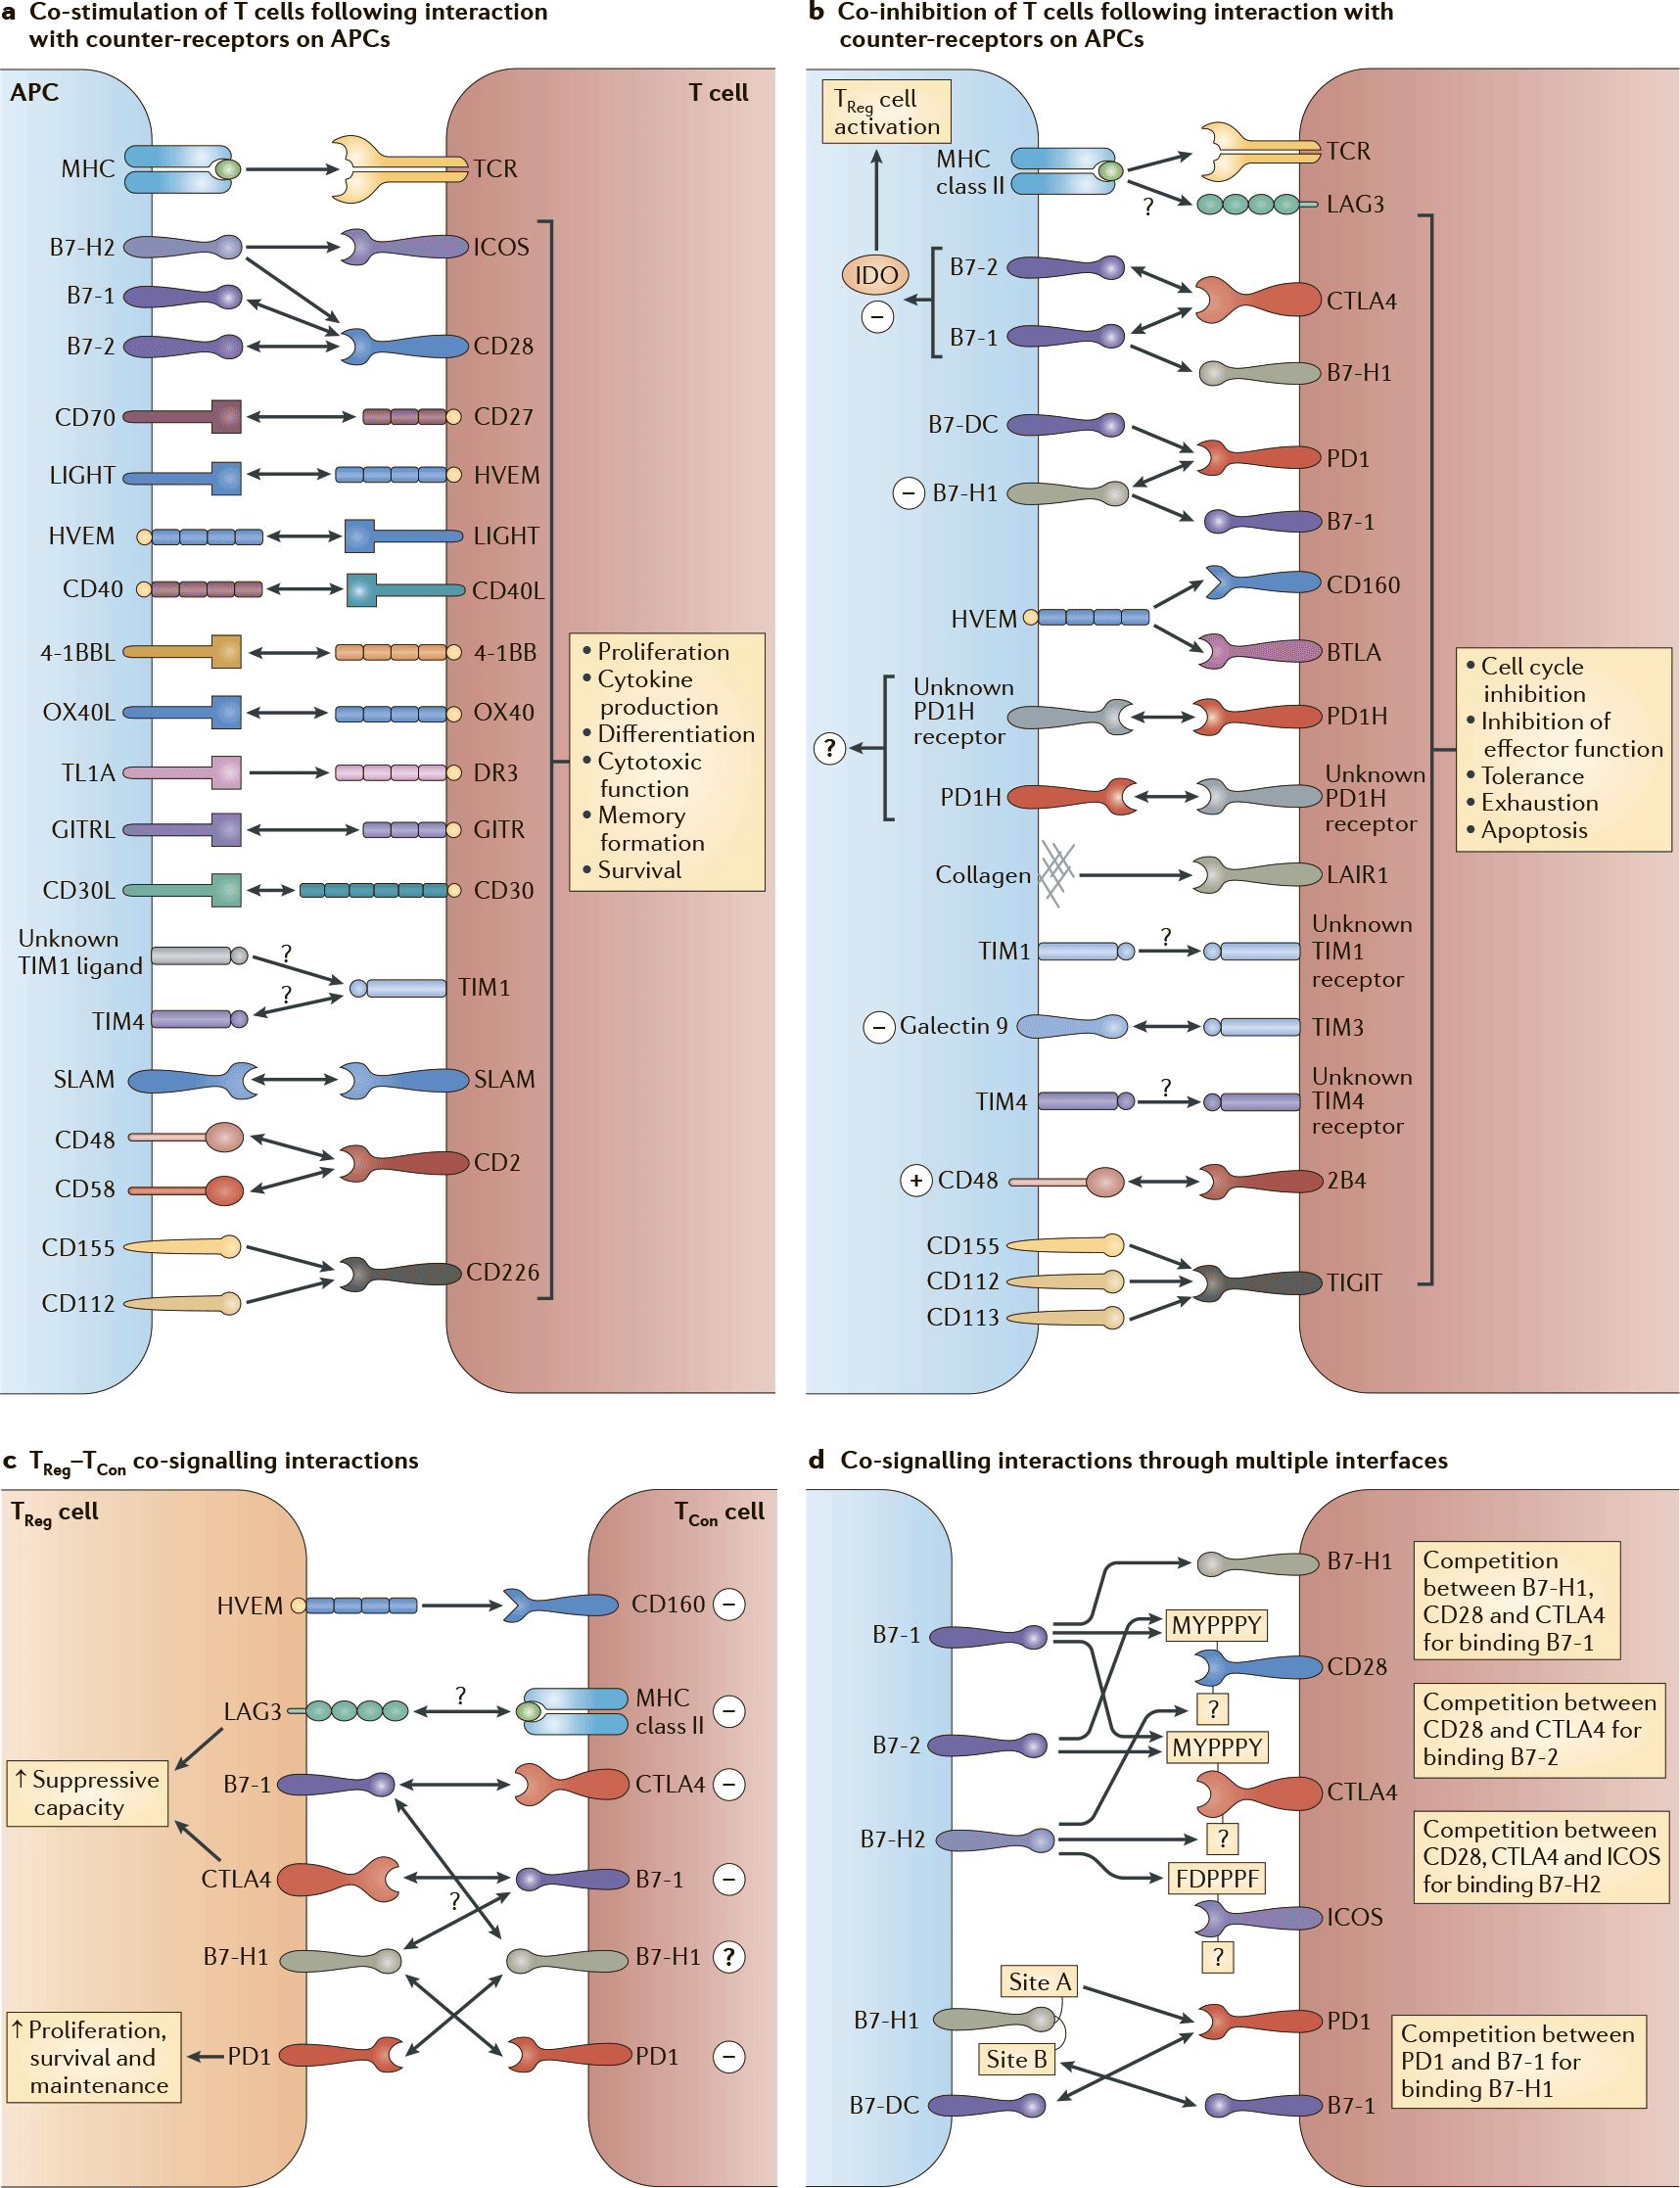 co stimulatory and co inhibitory t cells molecules - STING: иммунологическое жало против раковых заболеваний